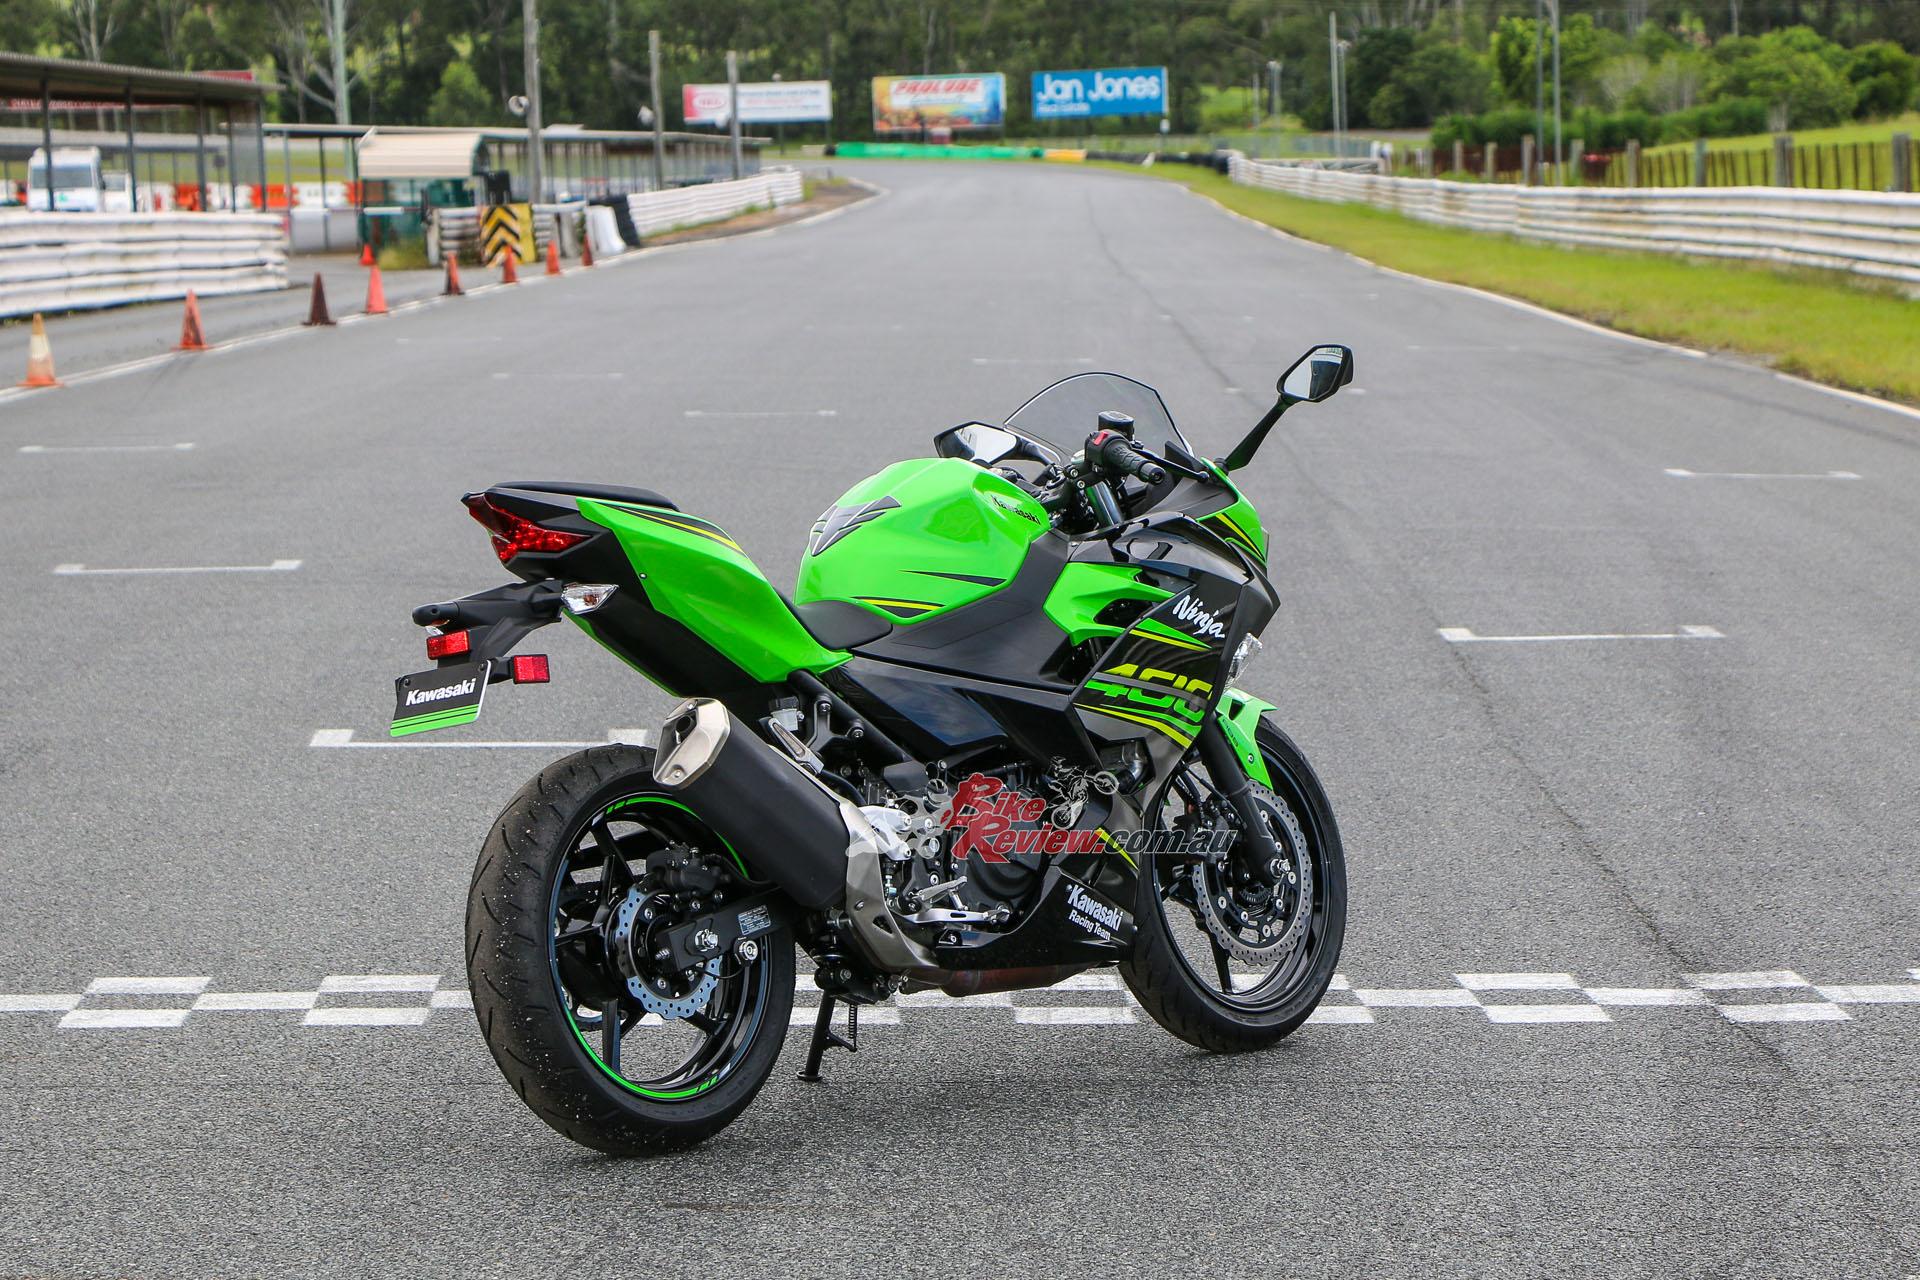 Review 2018 Kawasaki Ninja 400 Australian Track Launch Bike Review